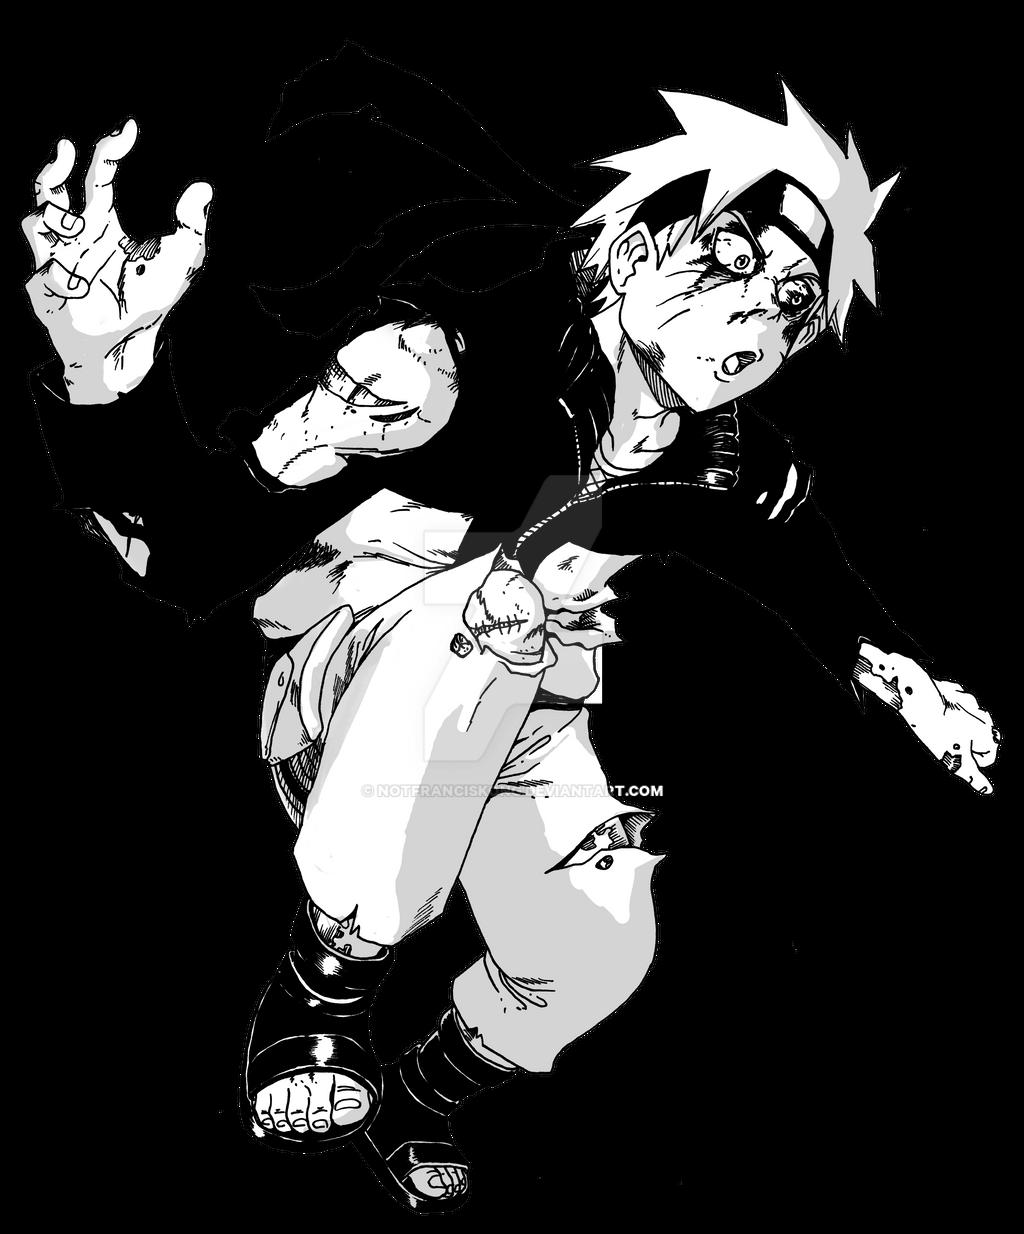 74 Gambar Naruto Zombie Paling Bagus